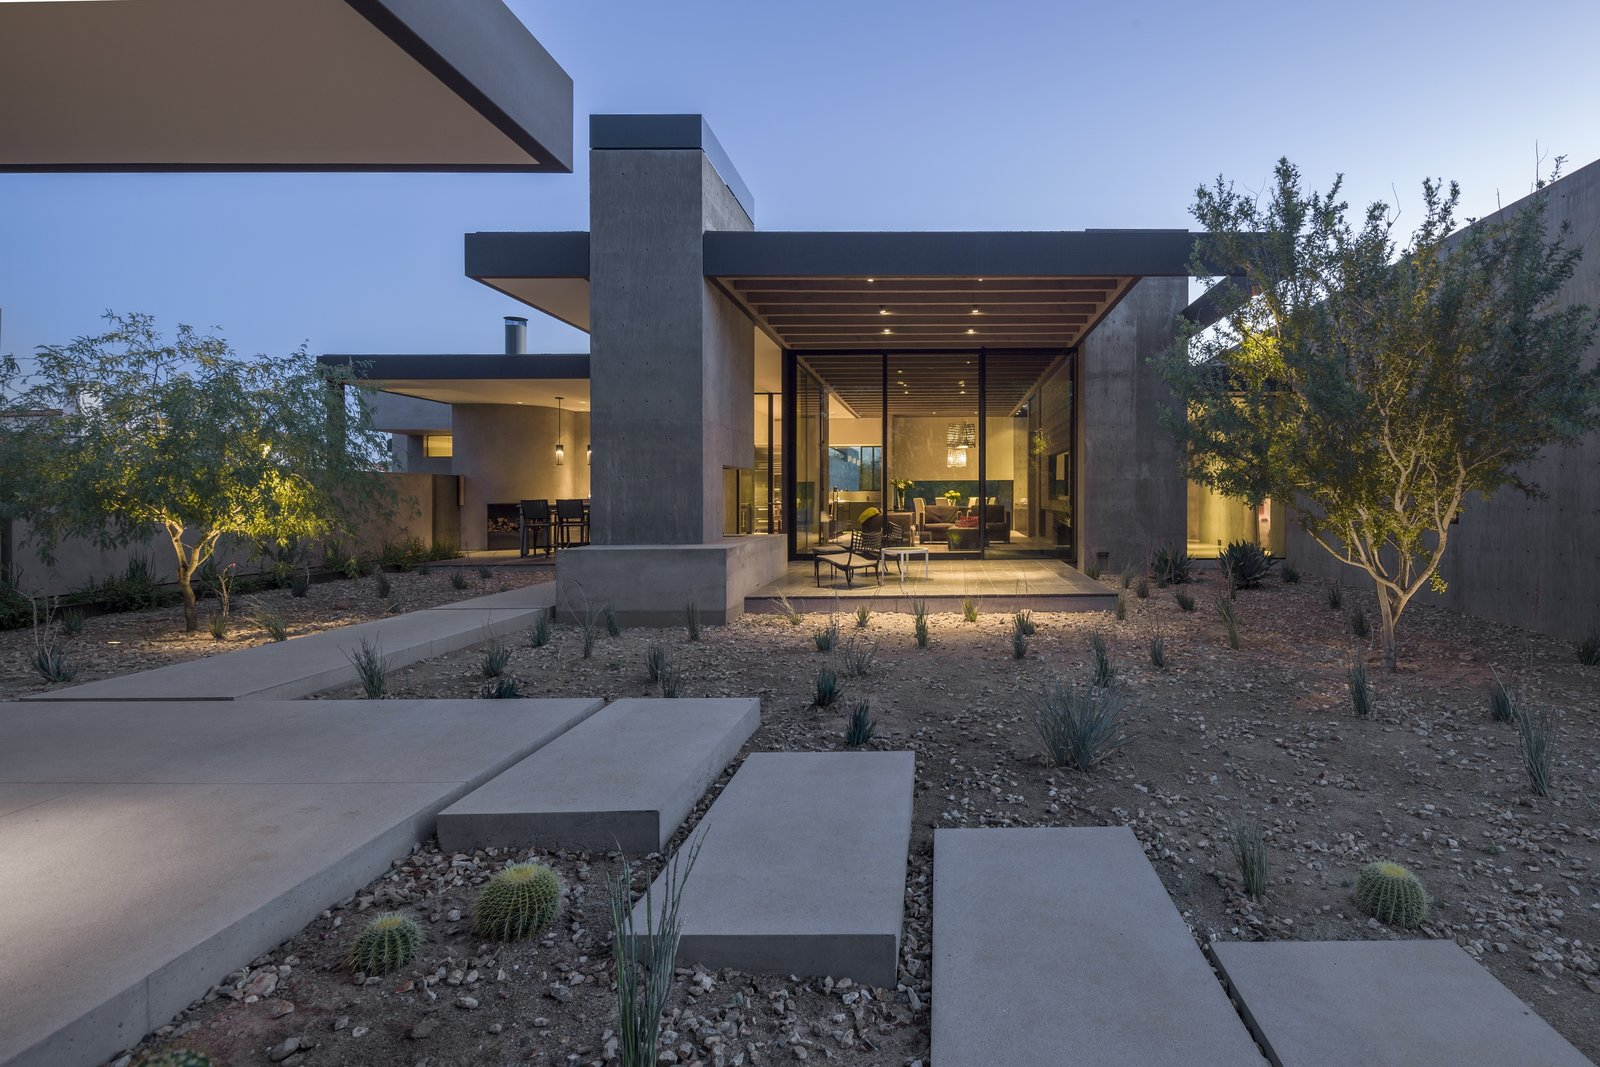 Outdoor, Desert, and Concrete Patio, Porch, Deck  DLL 59 by TENNEN   STUDIO